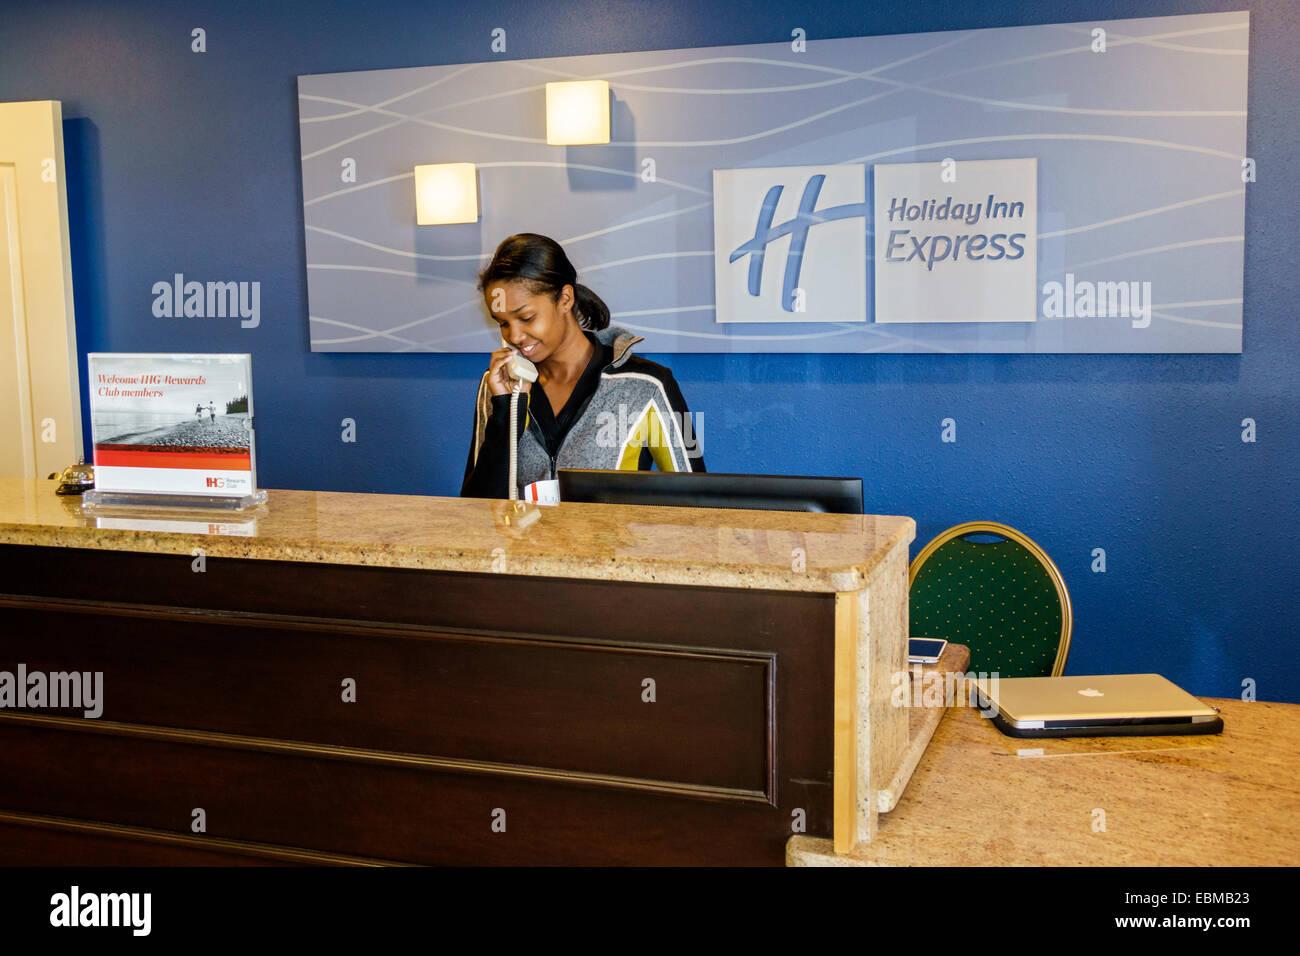 Clermont Florida Holiday Inn Express Motel Lobby Front Desk Reception Black  Woman Employee Job